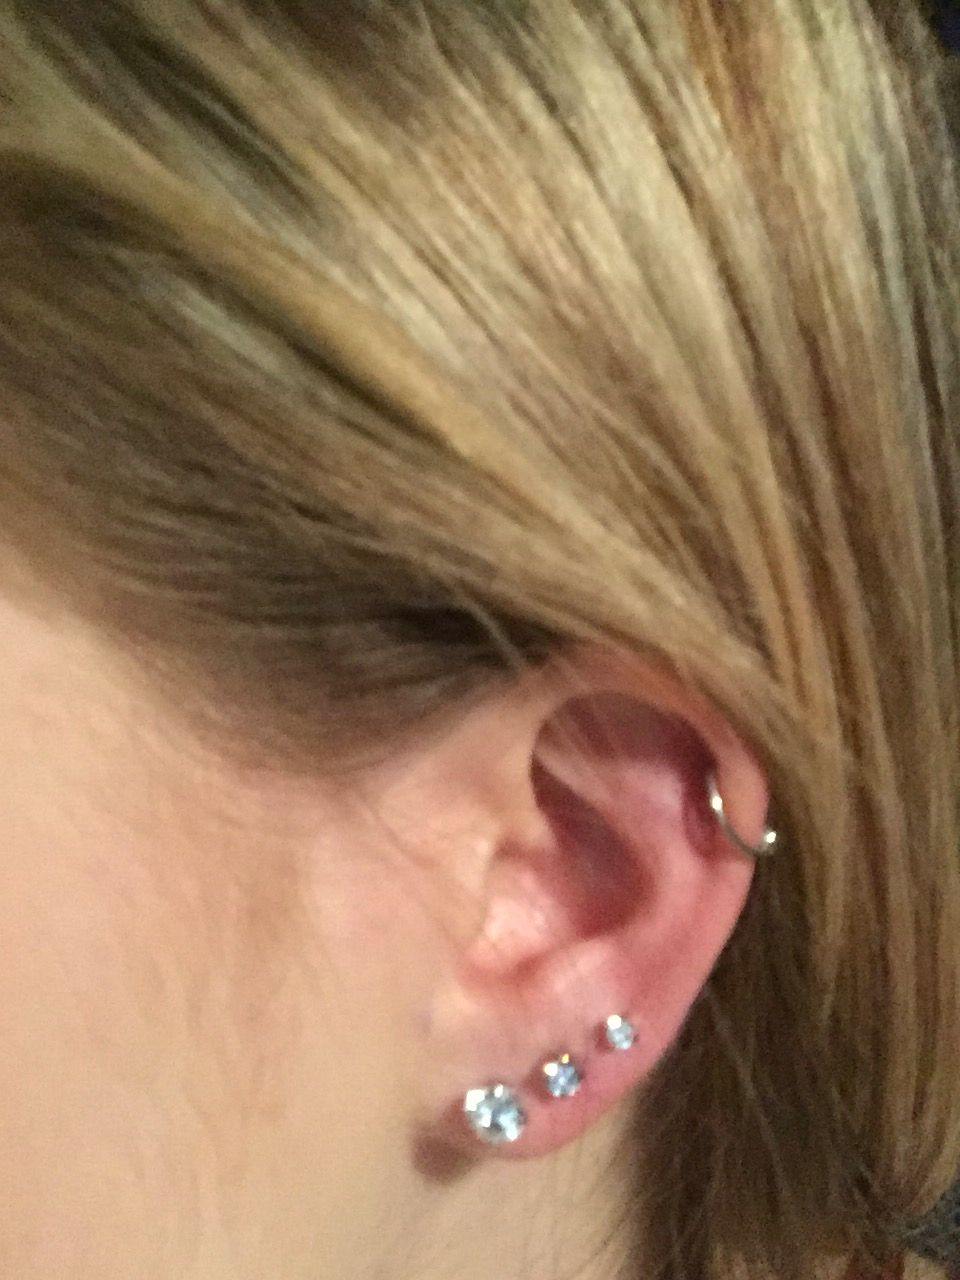 New piercing ideas  New piercings from Body Tech B  Tattoos and Piercings